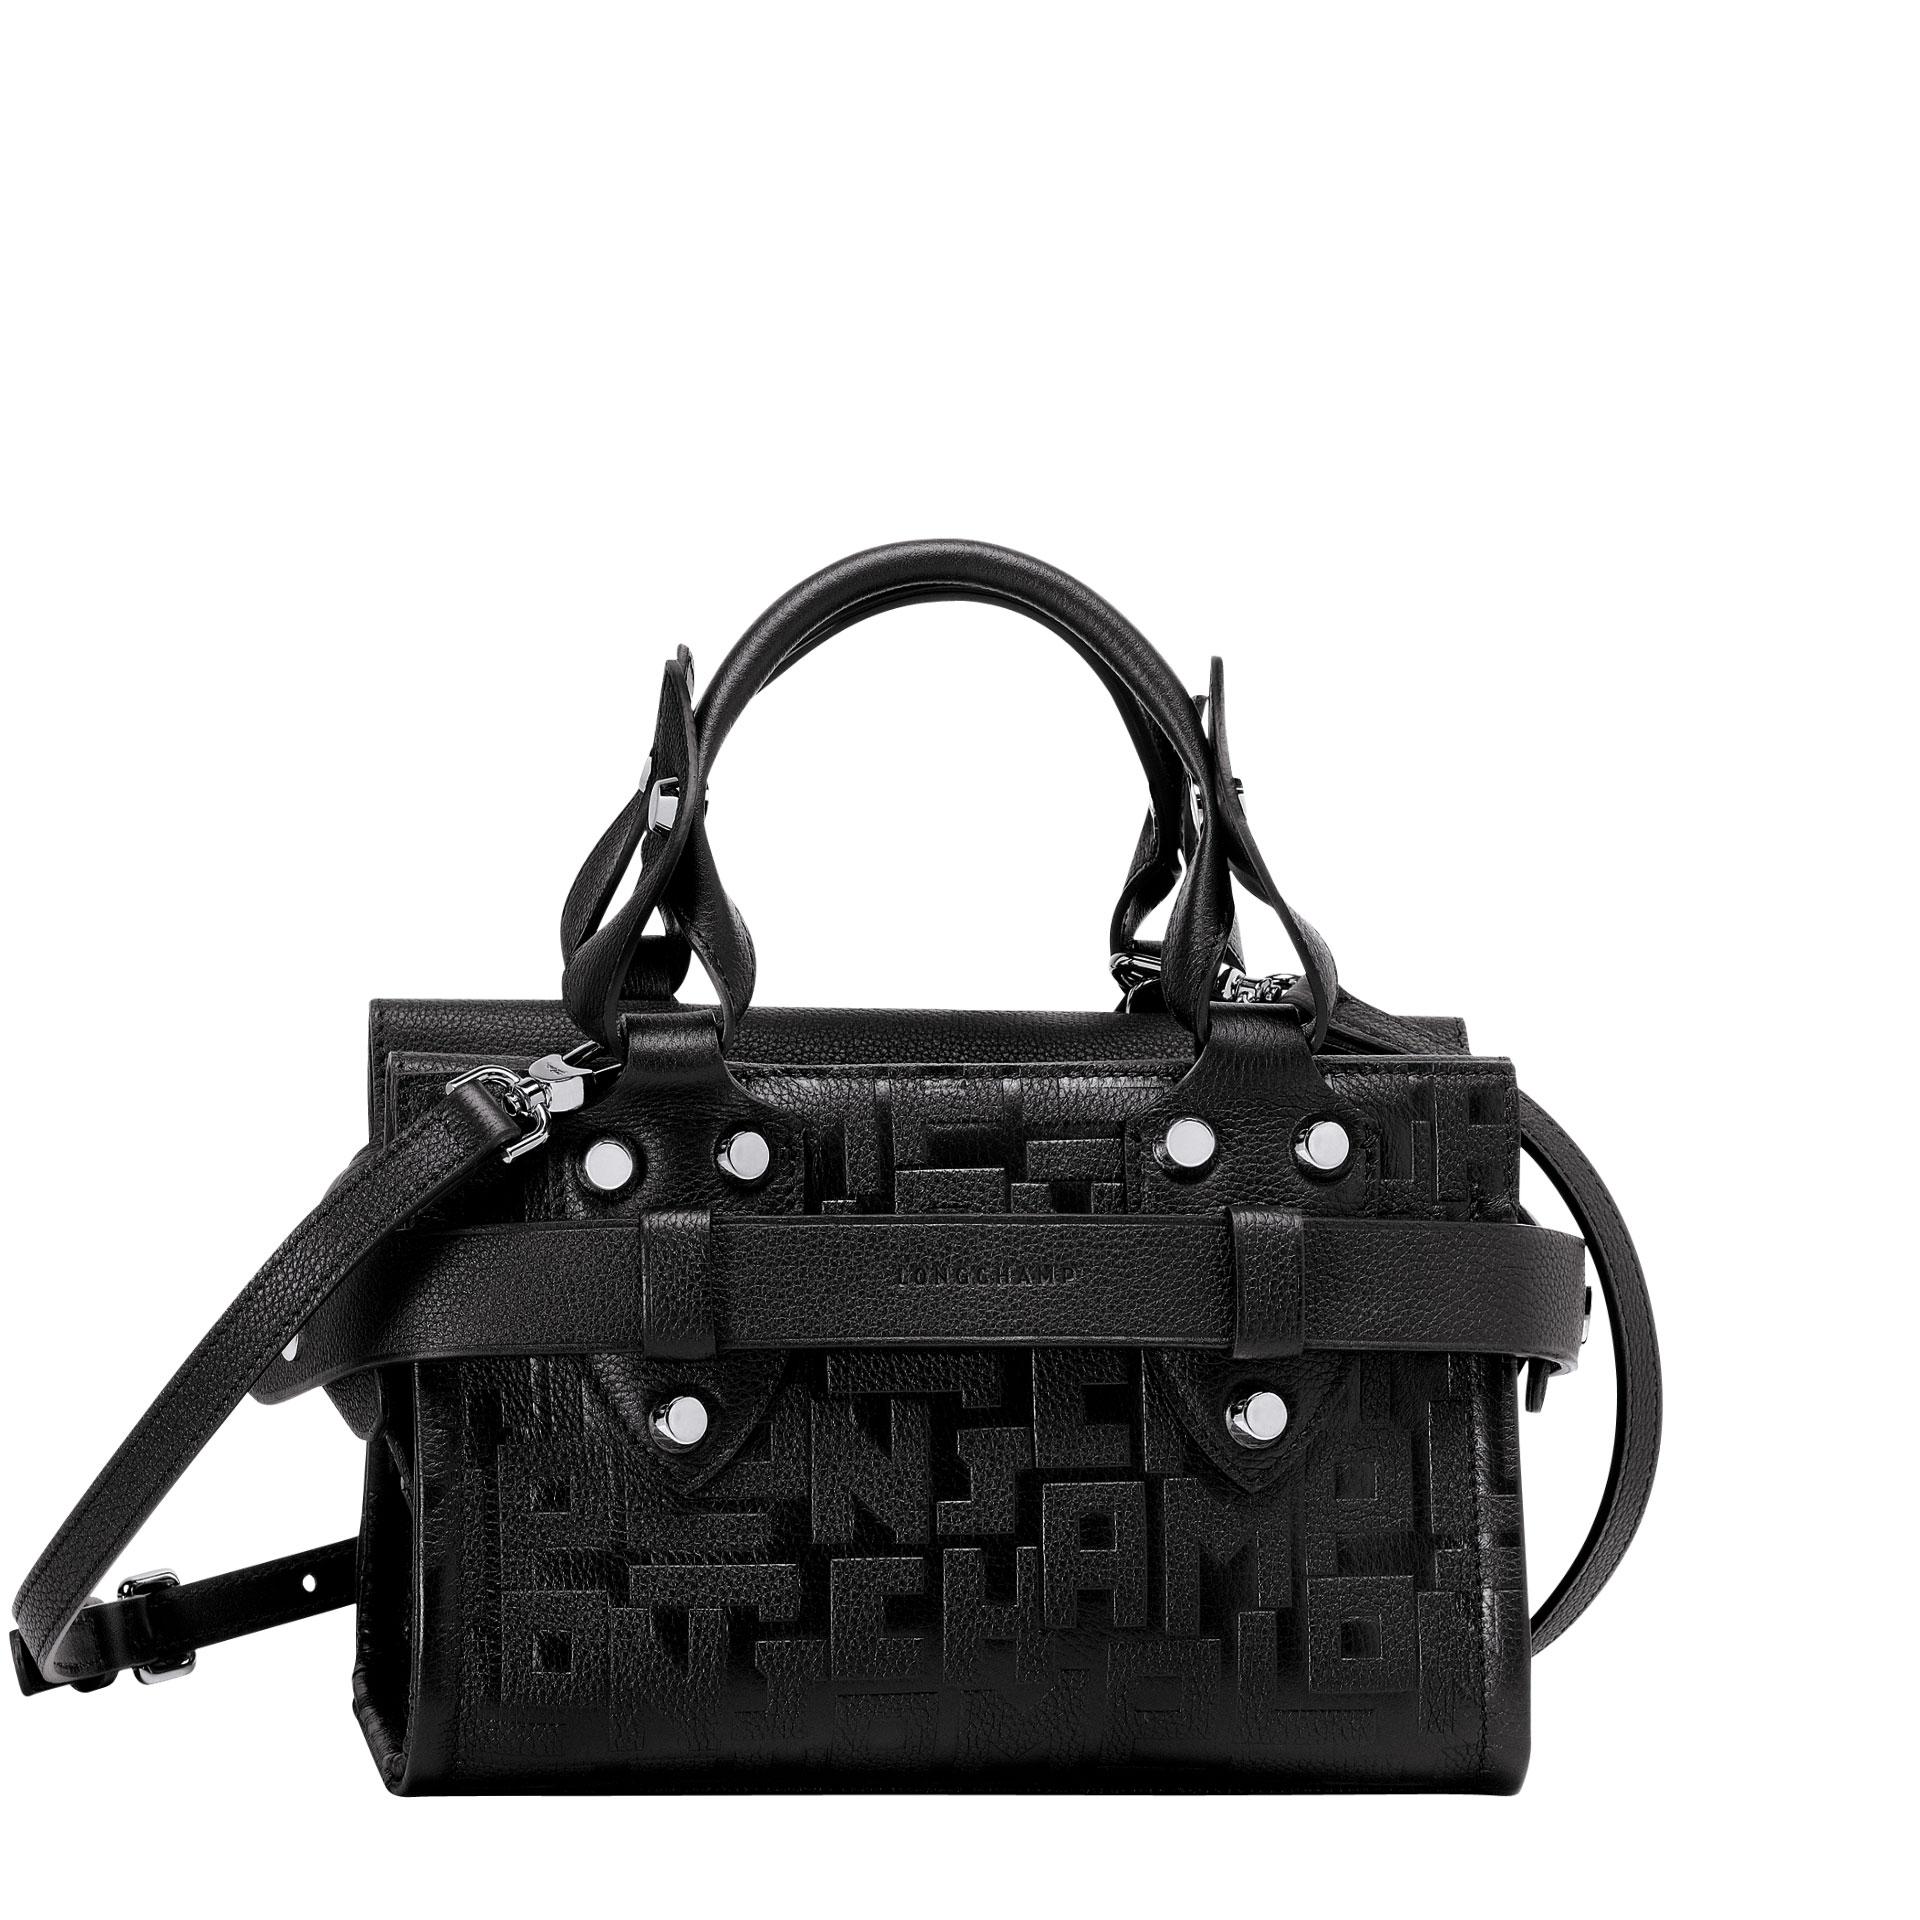 Longchamp La Voyageuse LGP Handtasche S black